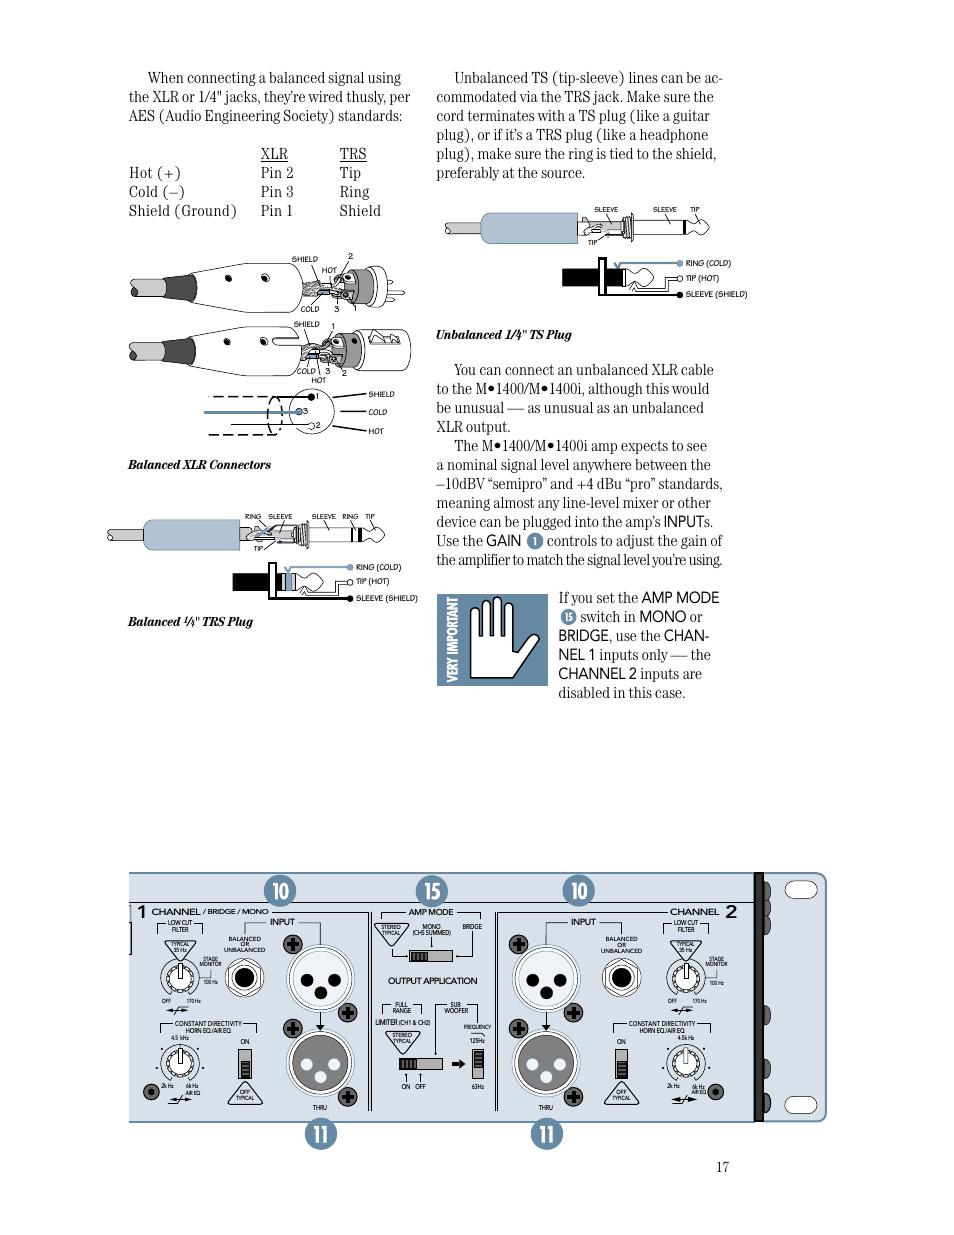 "Speaker outputs, unbalanced 1/4"" ts plug, balanced xlr connectors."